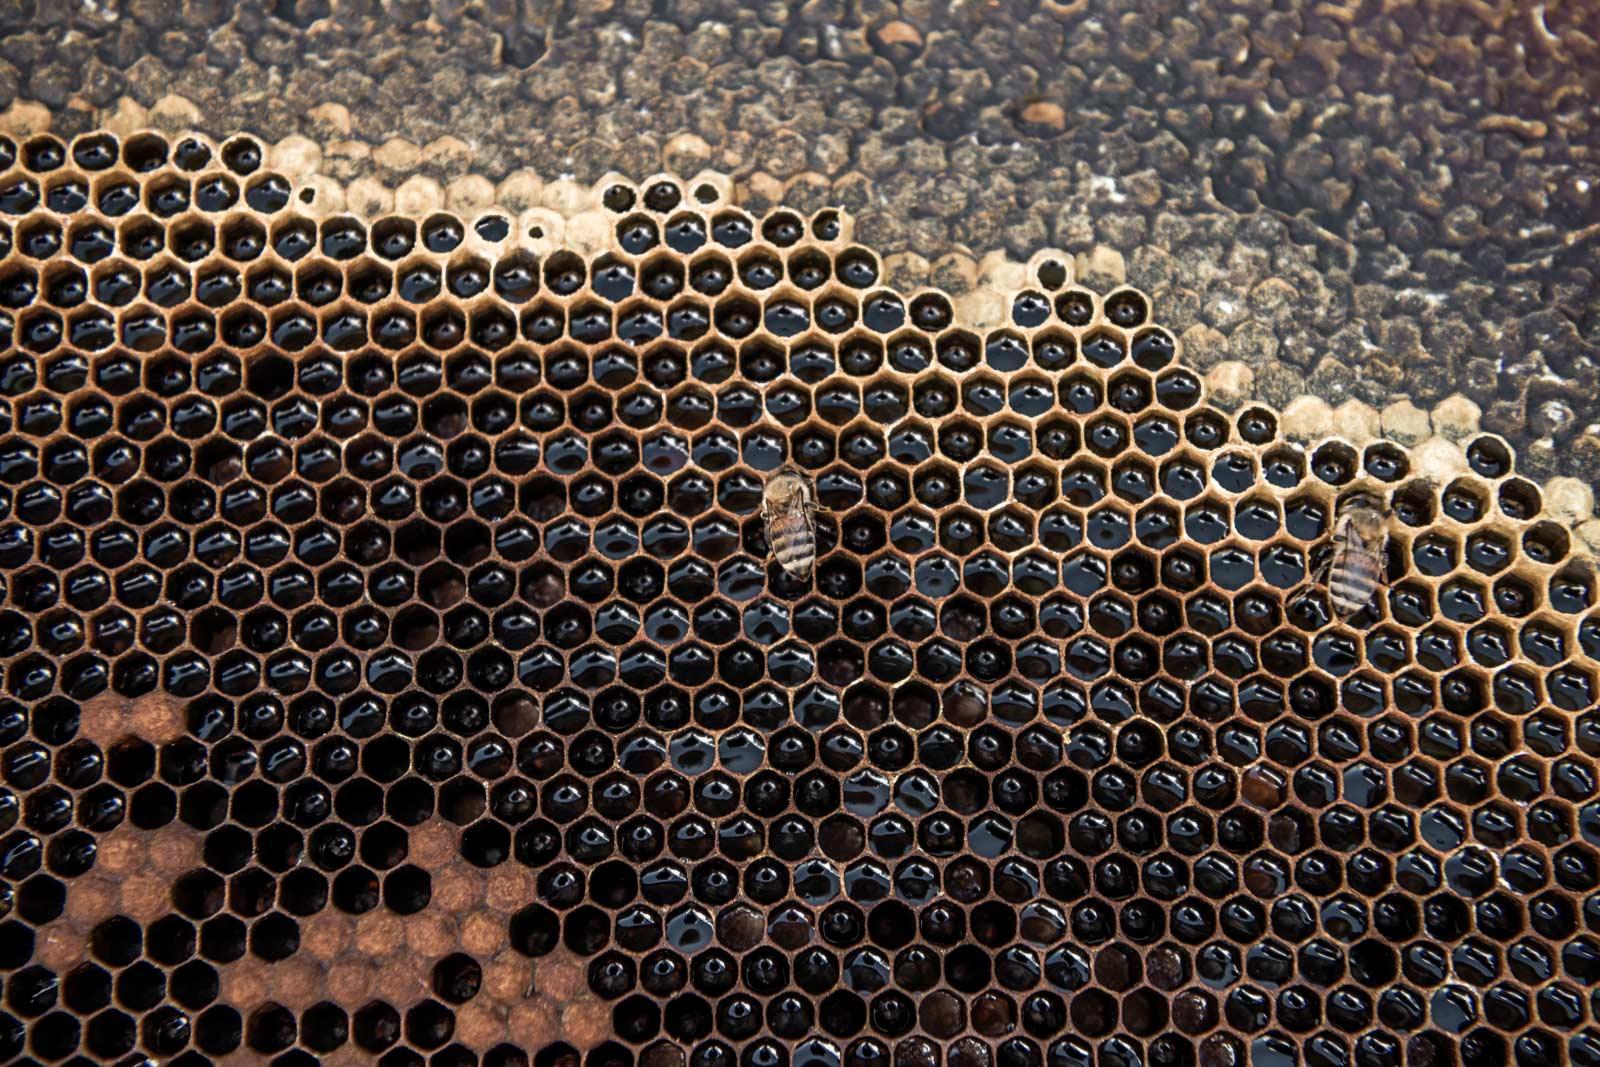 honeycomb-up-close